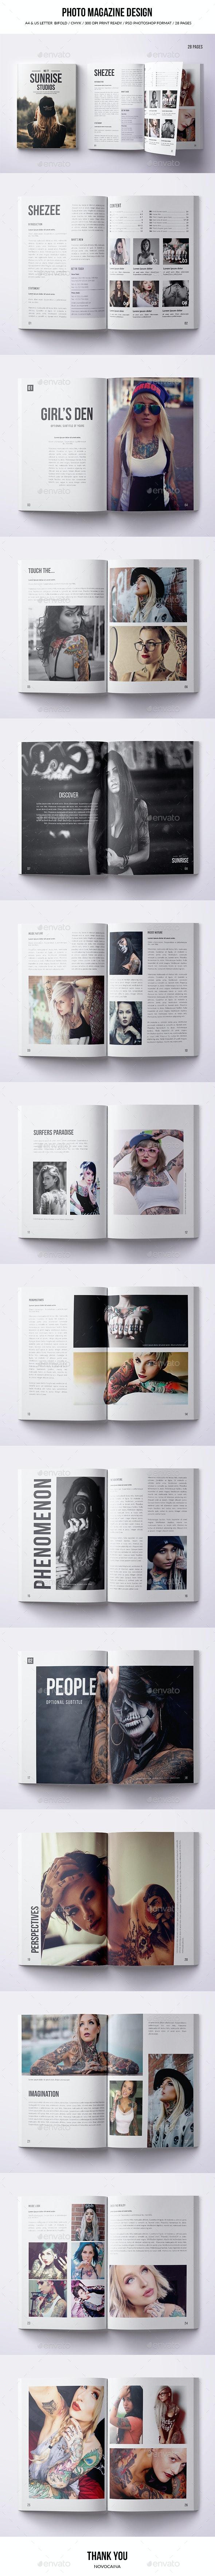 Multipurpose Photo Magazine - A4 & US Letter - 28 Pgs - Magazines Print Templates